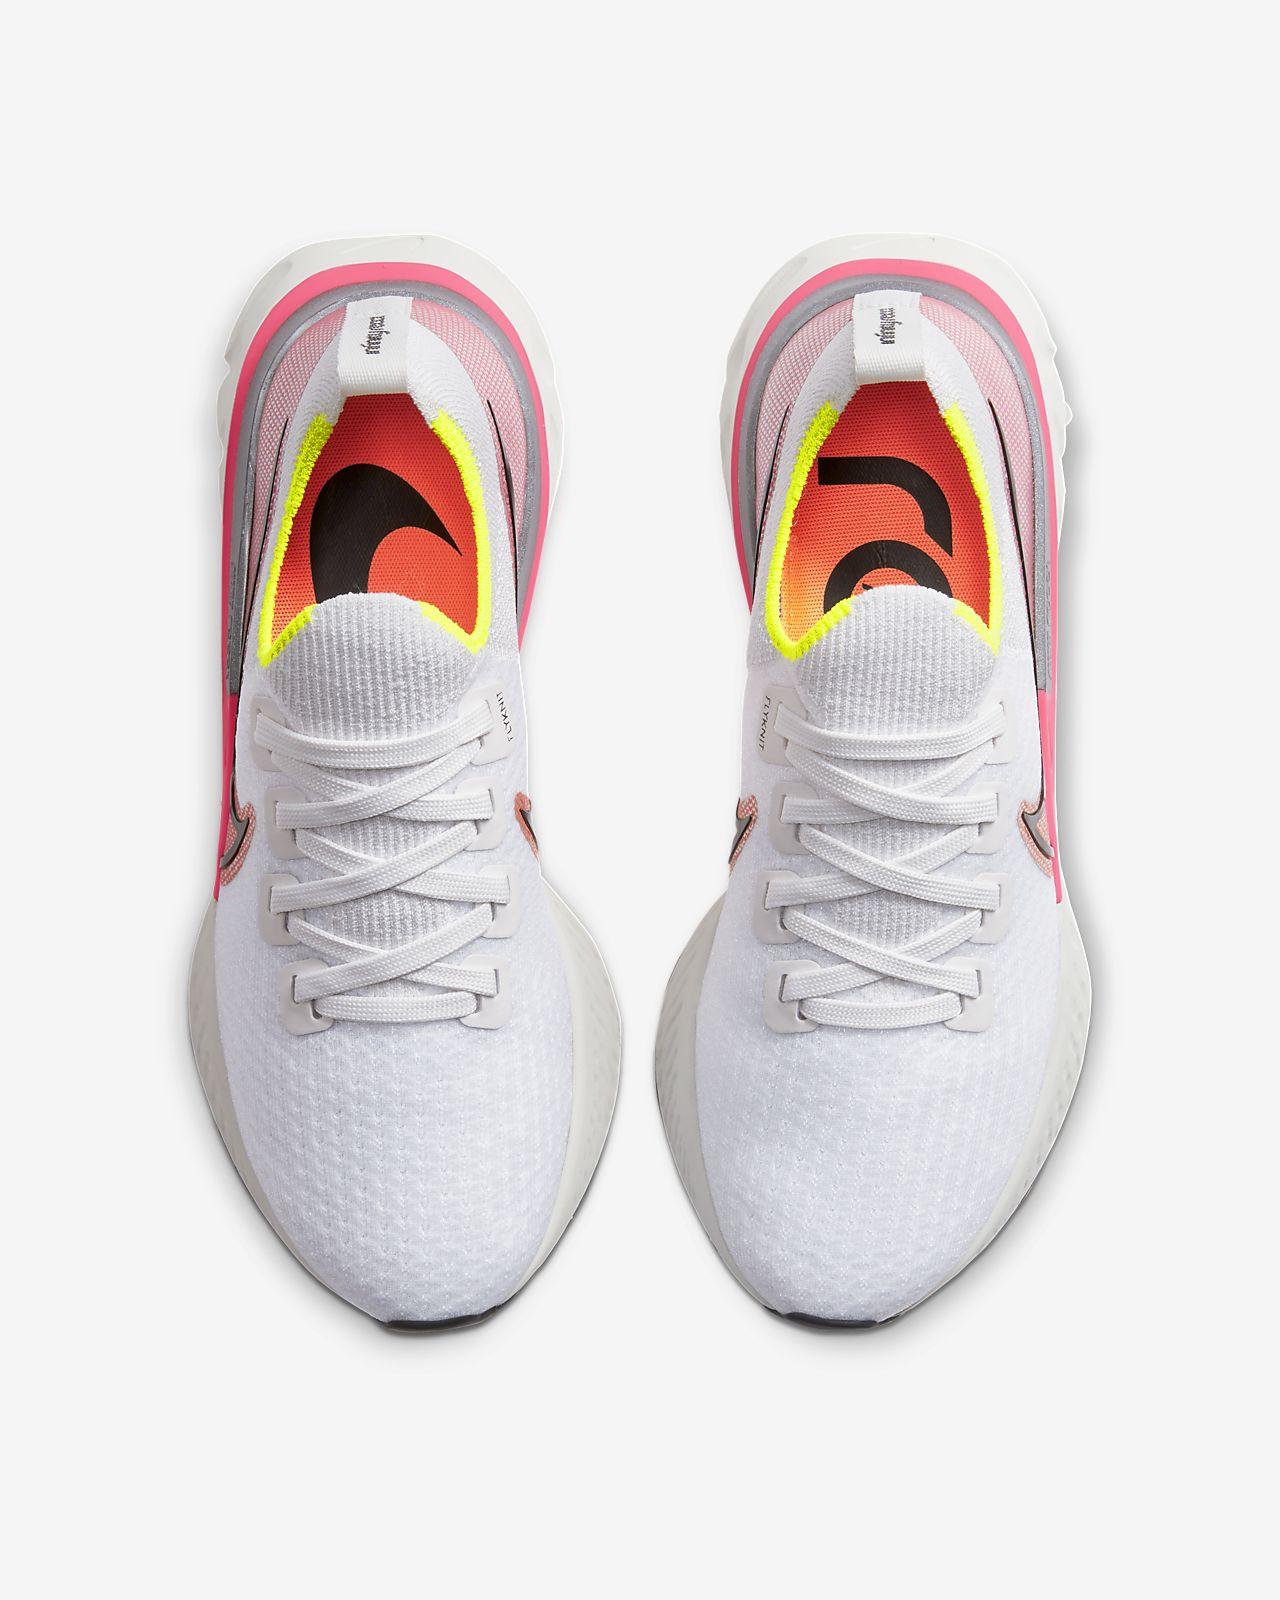 mizuno womens volleyball shoes size 8 x 3 inch medium nike zoom